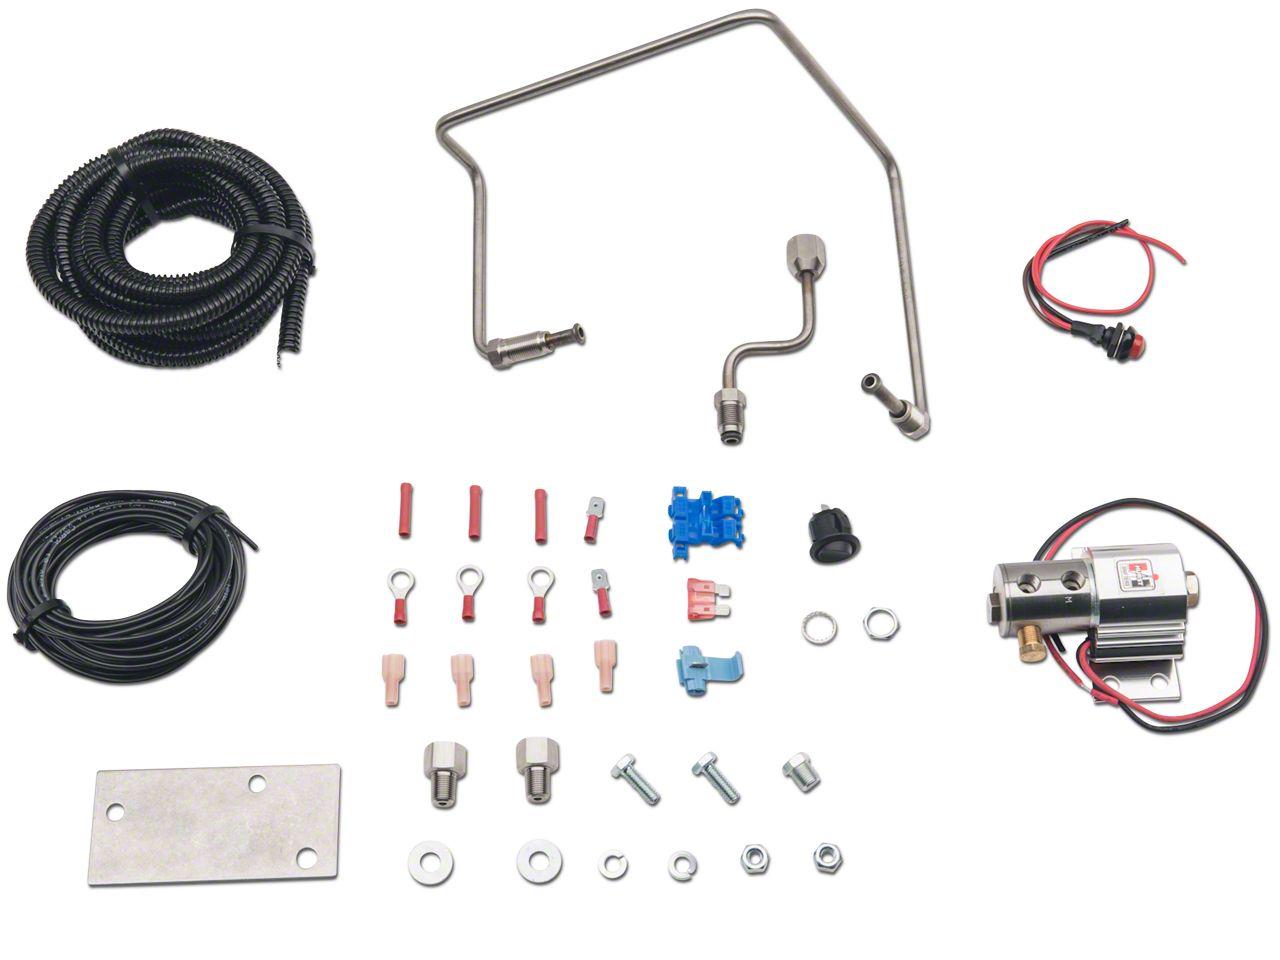 Add Hurst Line Lock - Roll Control Kit (05-09 GT, V6)